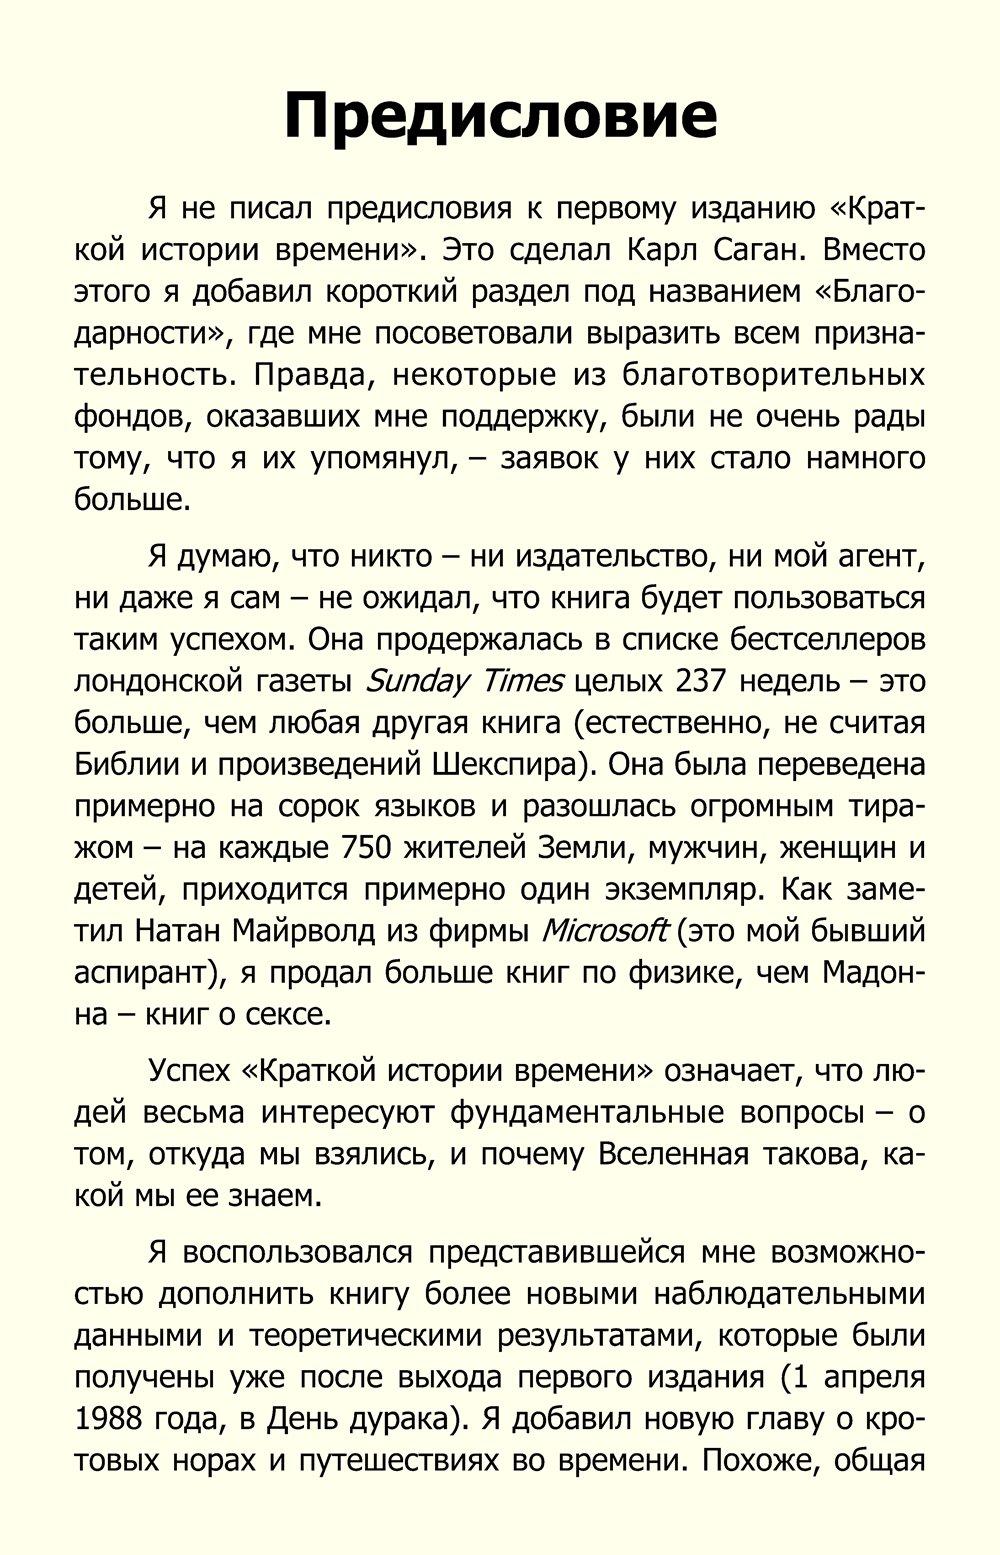 http://ipic.su/img/img7/fs/Kratkayaistoriyavremeni.1554796283.jpg